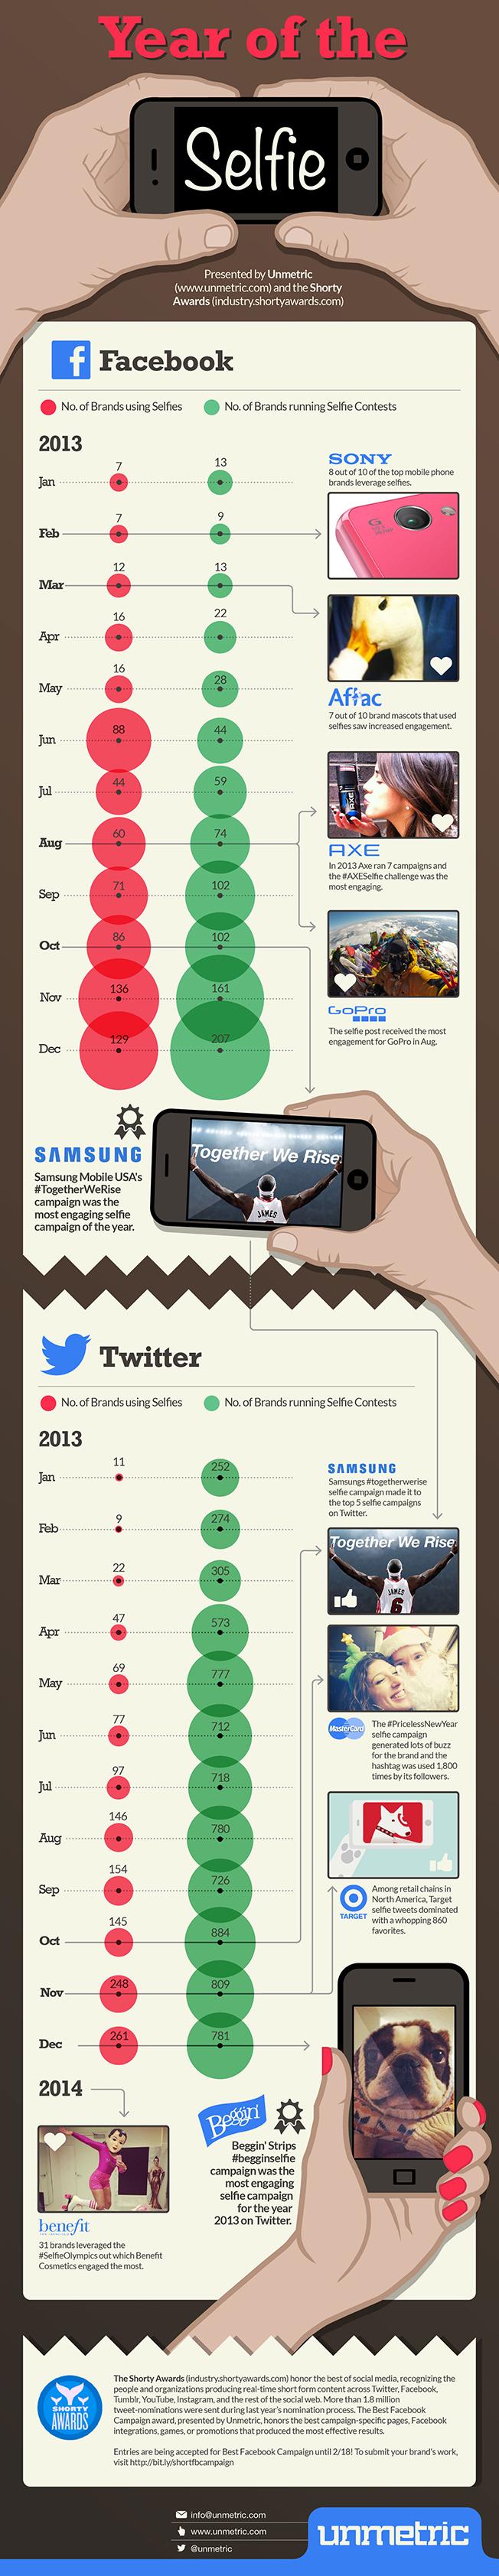 selfy-unmetric-infographic-2014